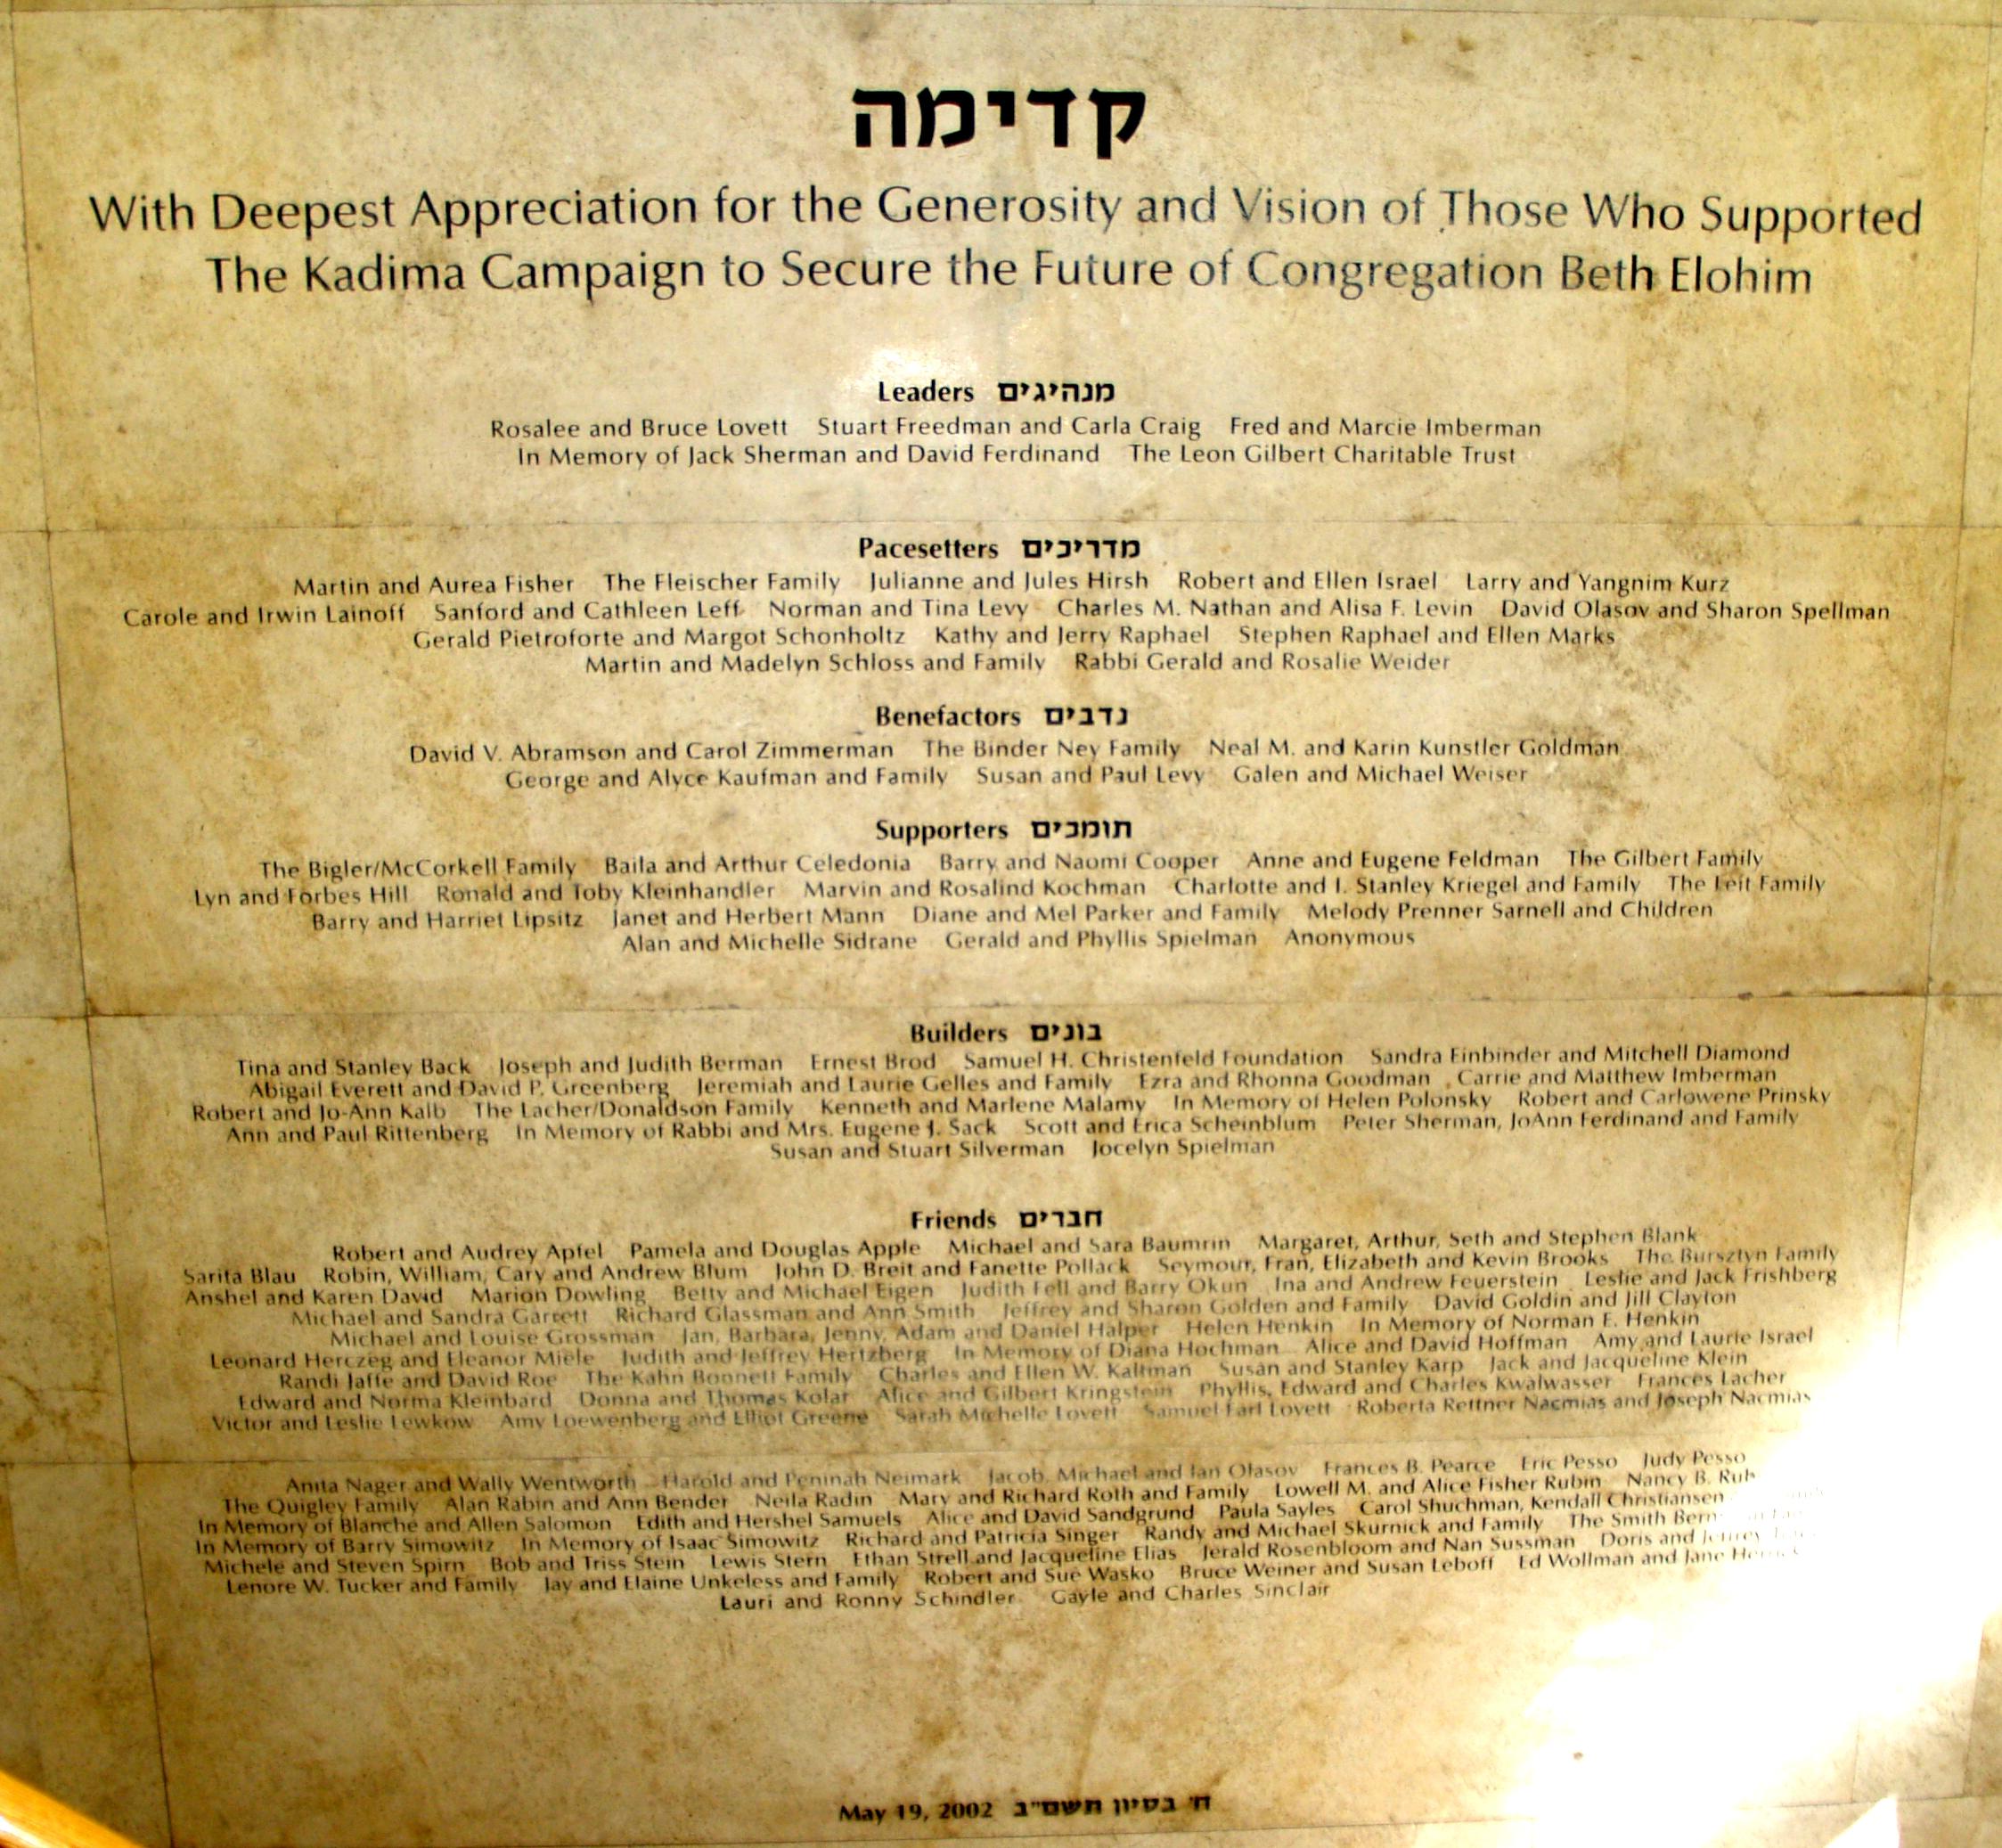 file congregation beth elohim kadima campaign jpg file congregation beth elohim kadima campaign jpg